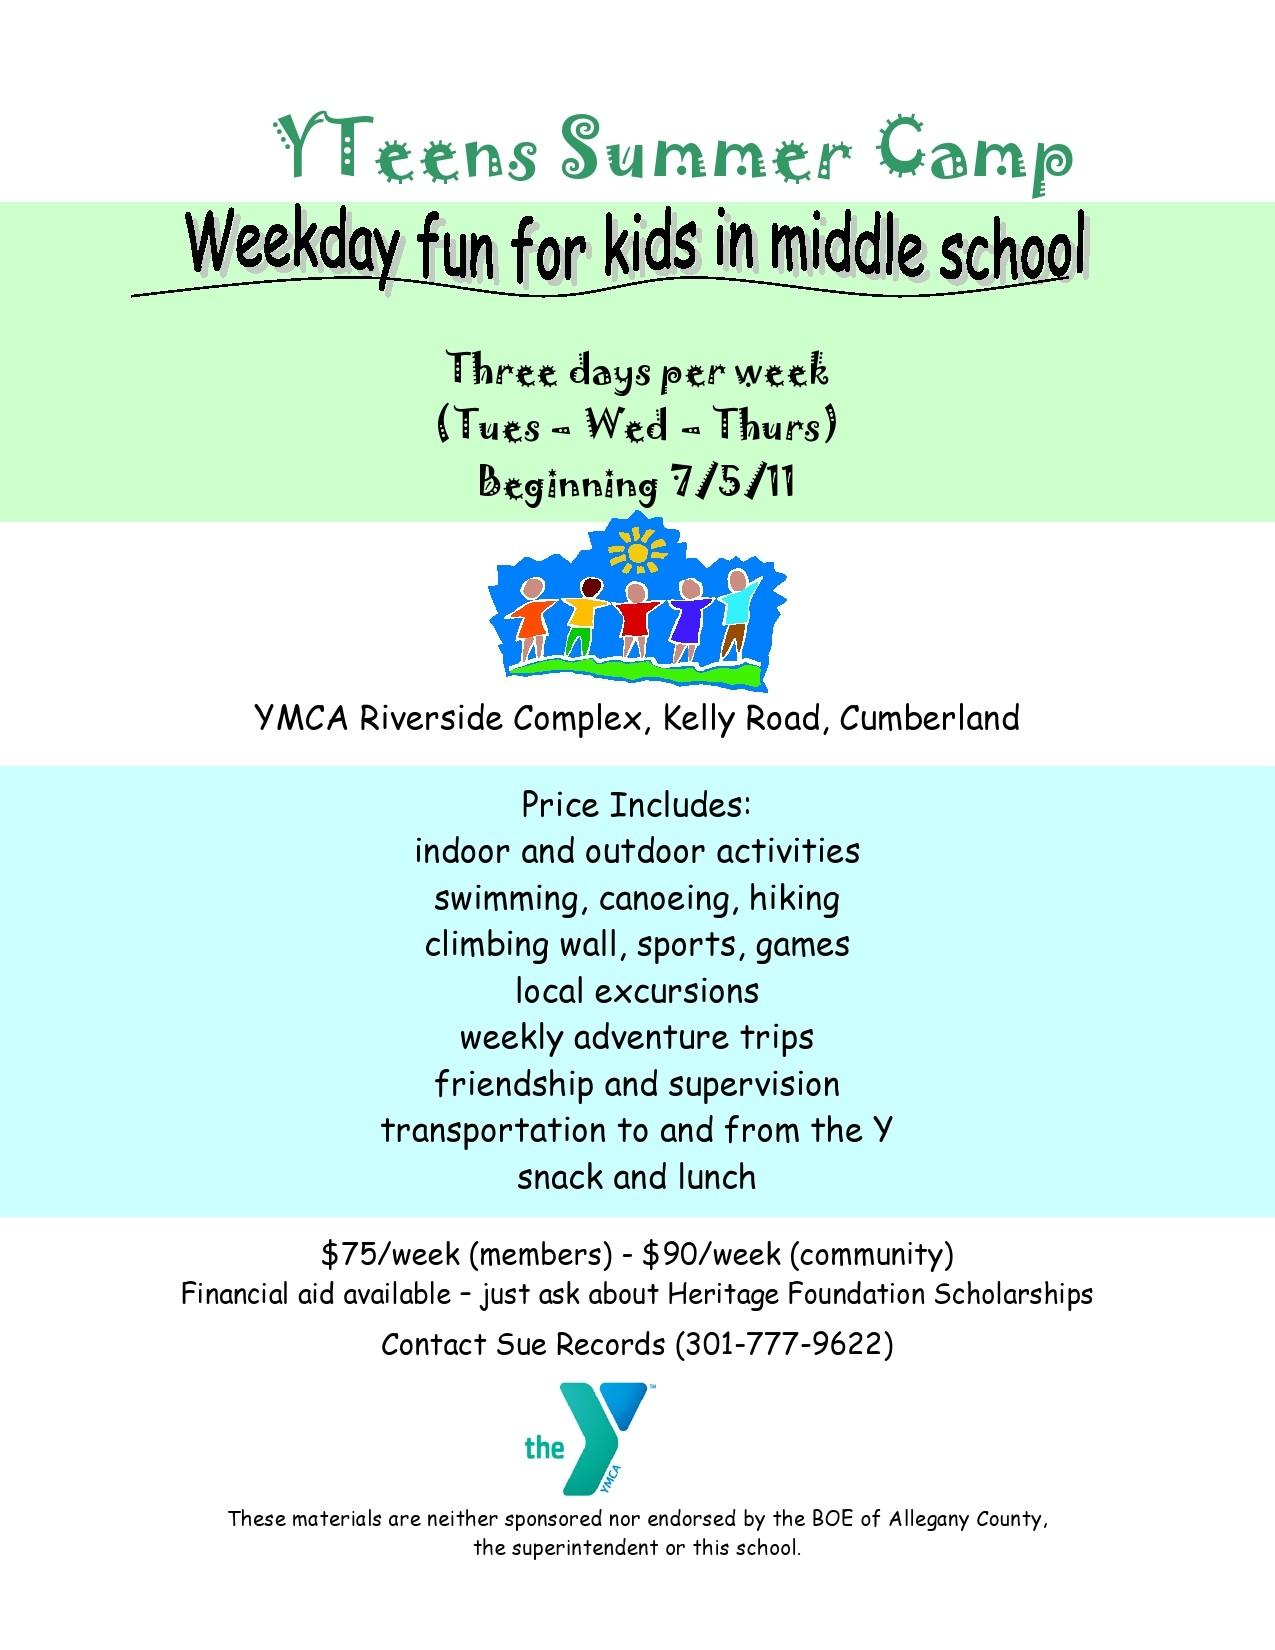 Free summer camp flyer 04